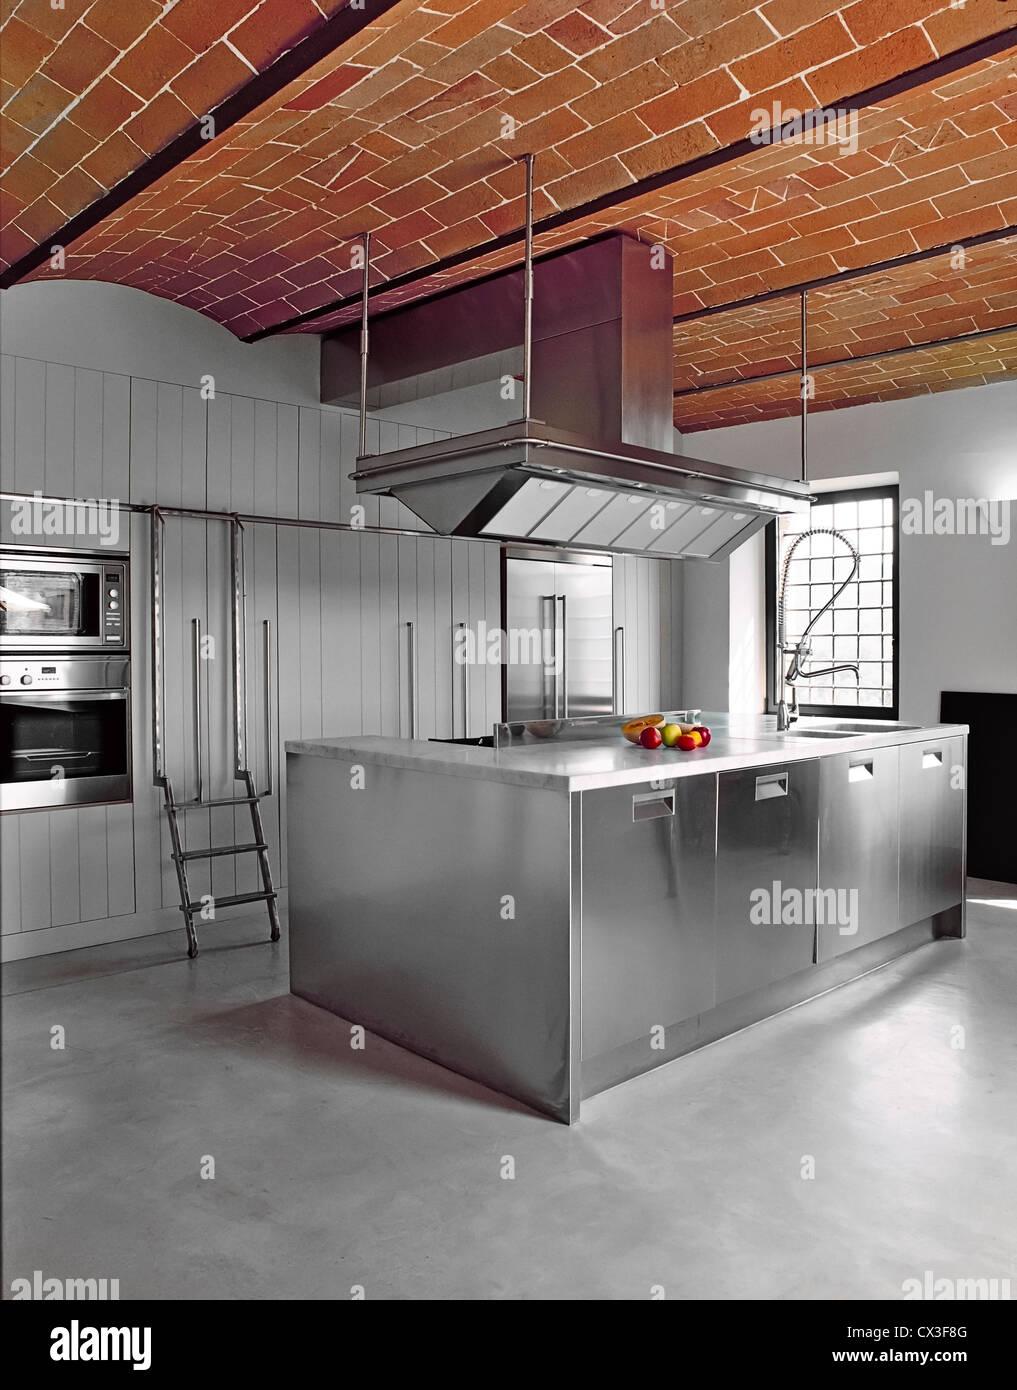 stock photo modern kitchen with concrete floor and bricks vaults concrete kitchen floor Stock Photo modern kitchen with concrete floor and bricks vaults